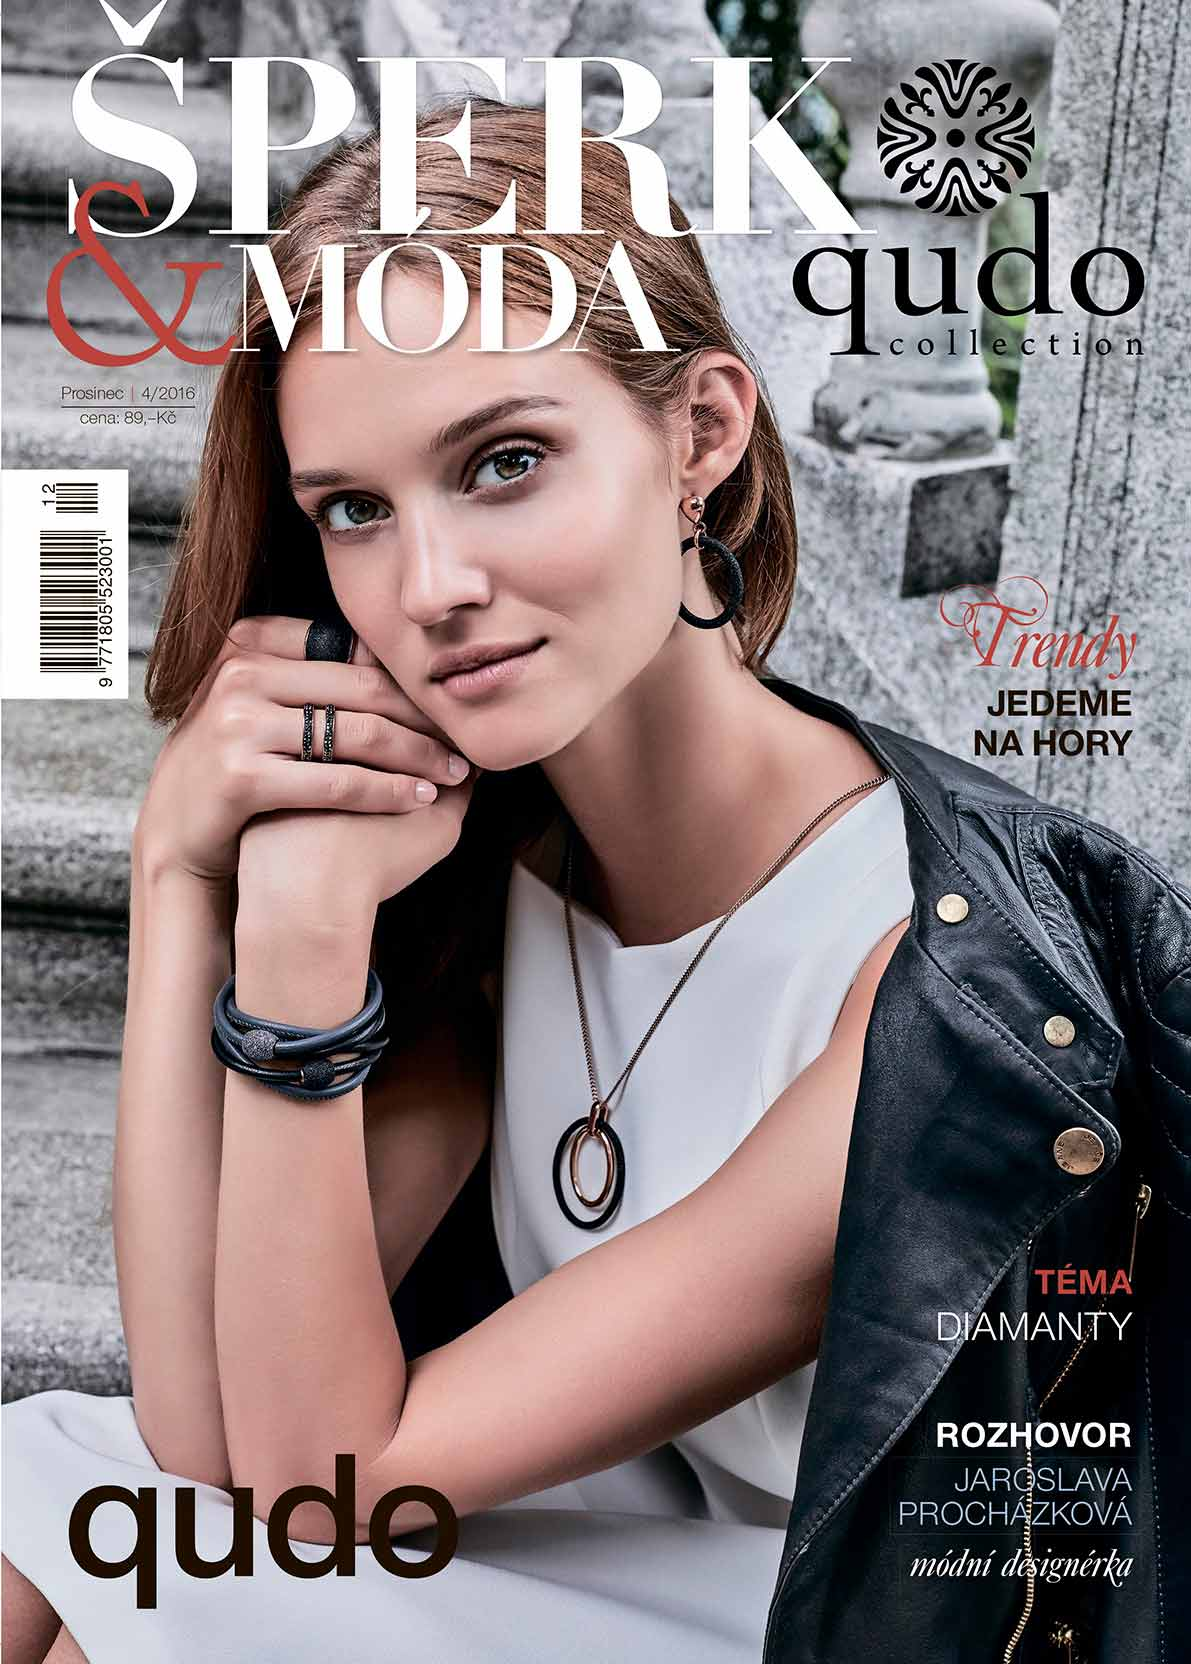 Sperk&Moda_04_2016_Omalgami-Olga-Beleacova-jeweler-Exclusive-Jewelry-Silver-magazine